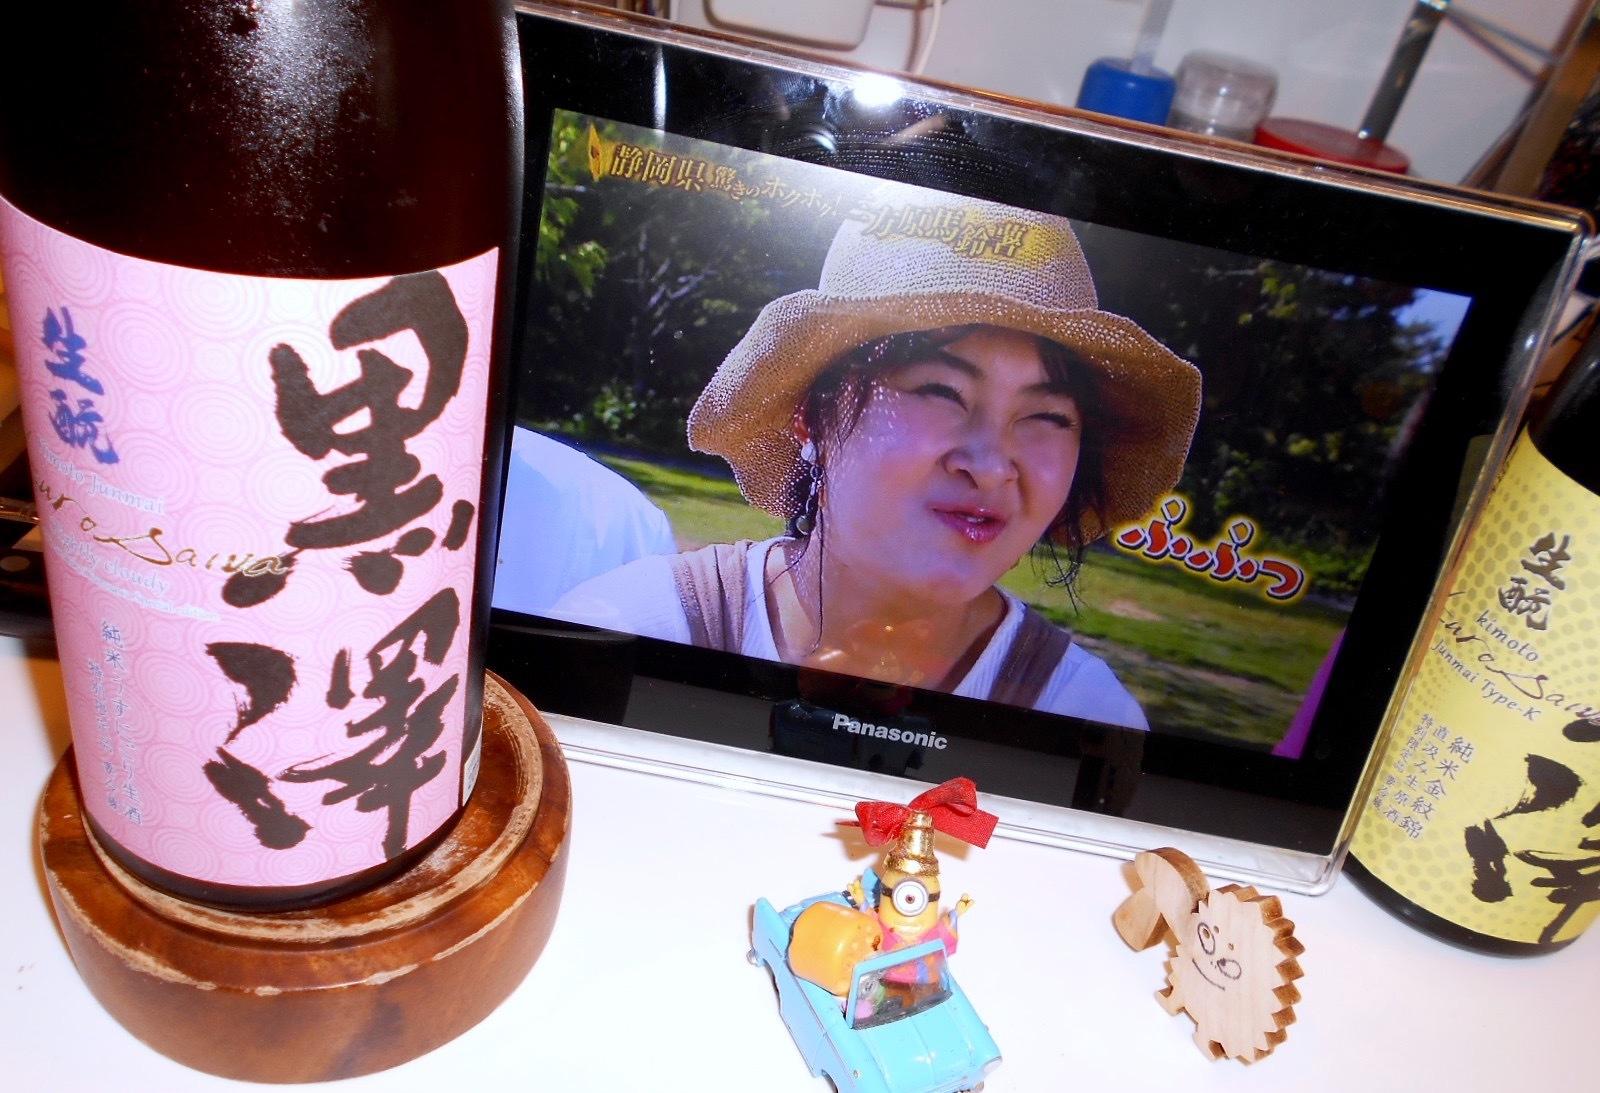 kurosawa_usunigori30by1.jpg